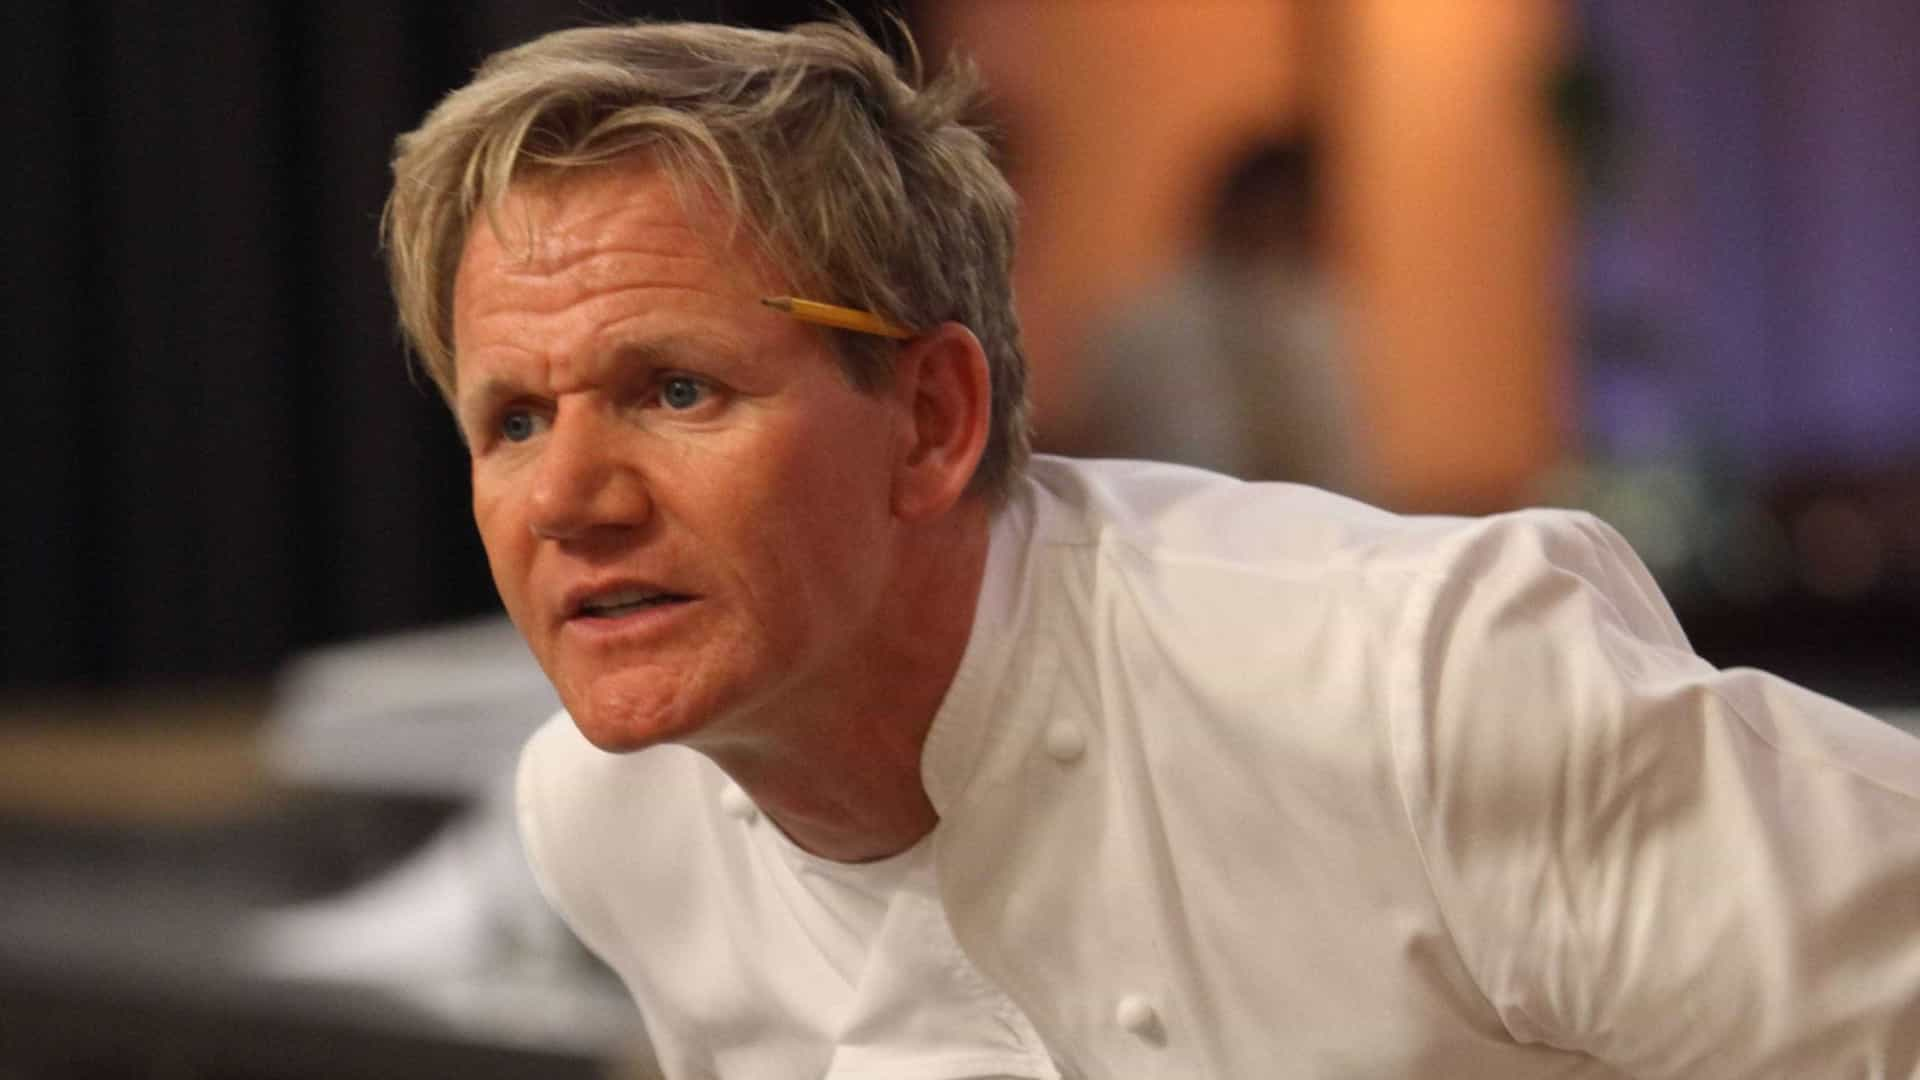 Após polémica, Gordon Ramsay dá oportunidade a dieta vegan